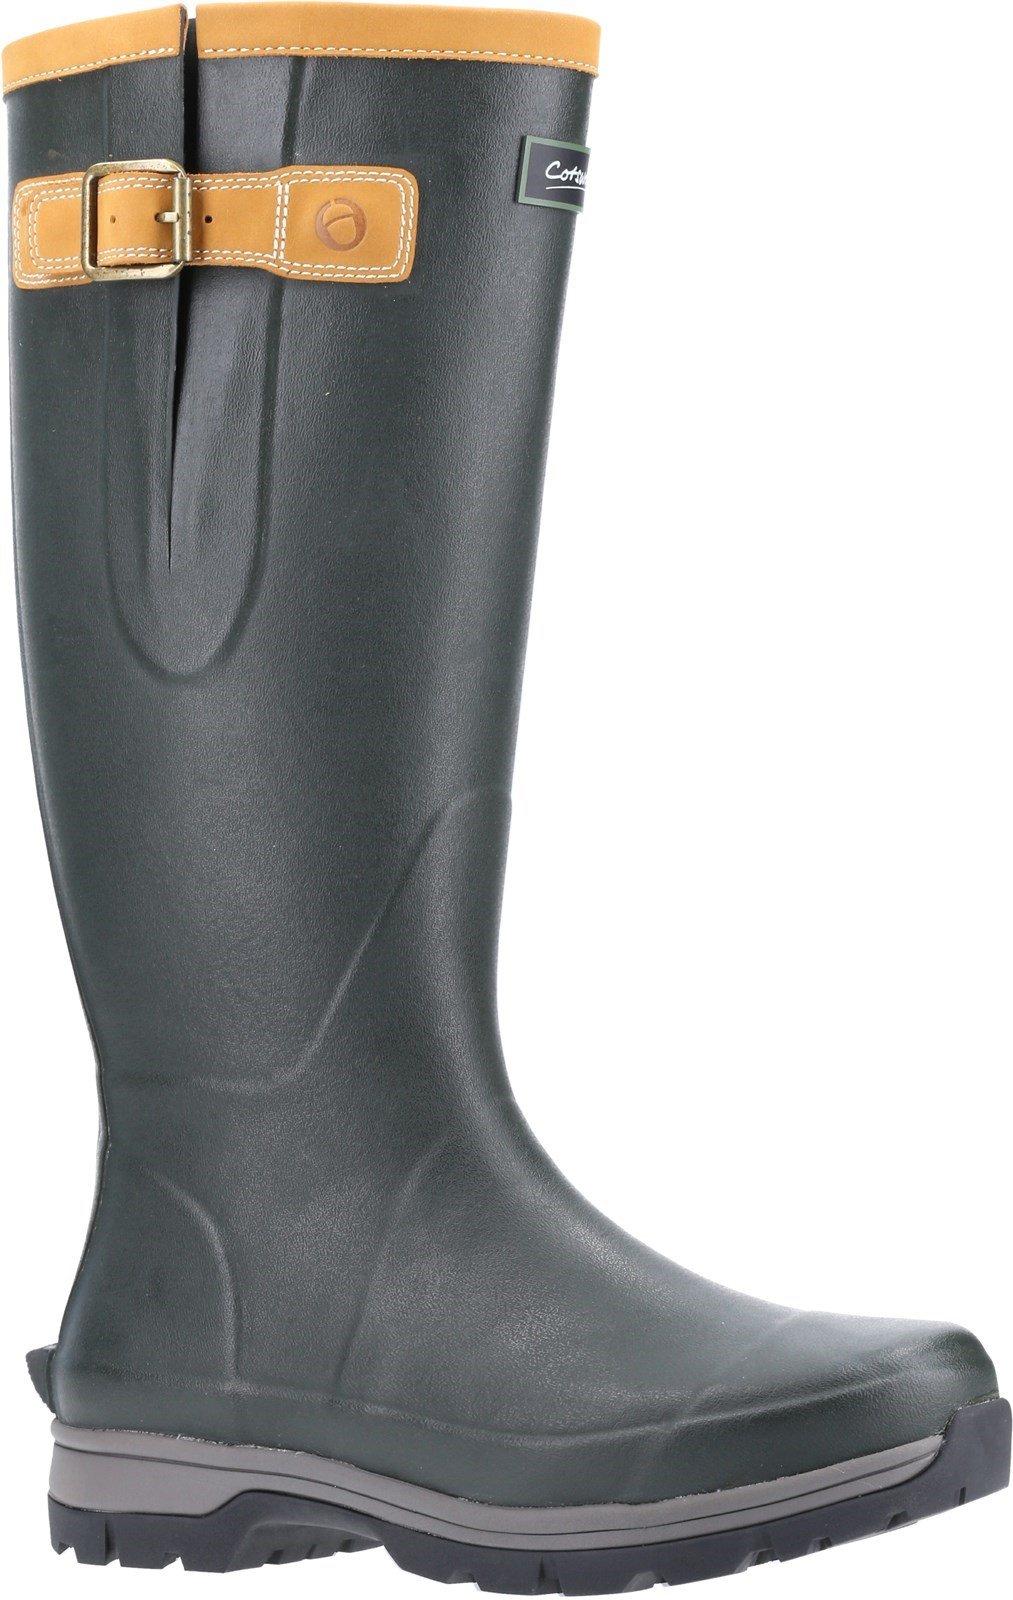 Cotswold Unisex Stratus Wellington Boot Green 31320 - Green 4